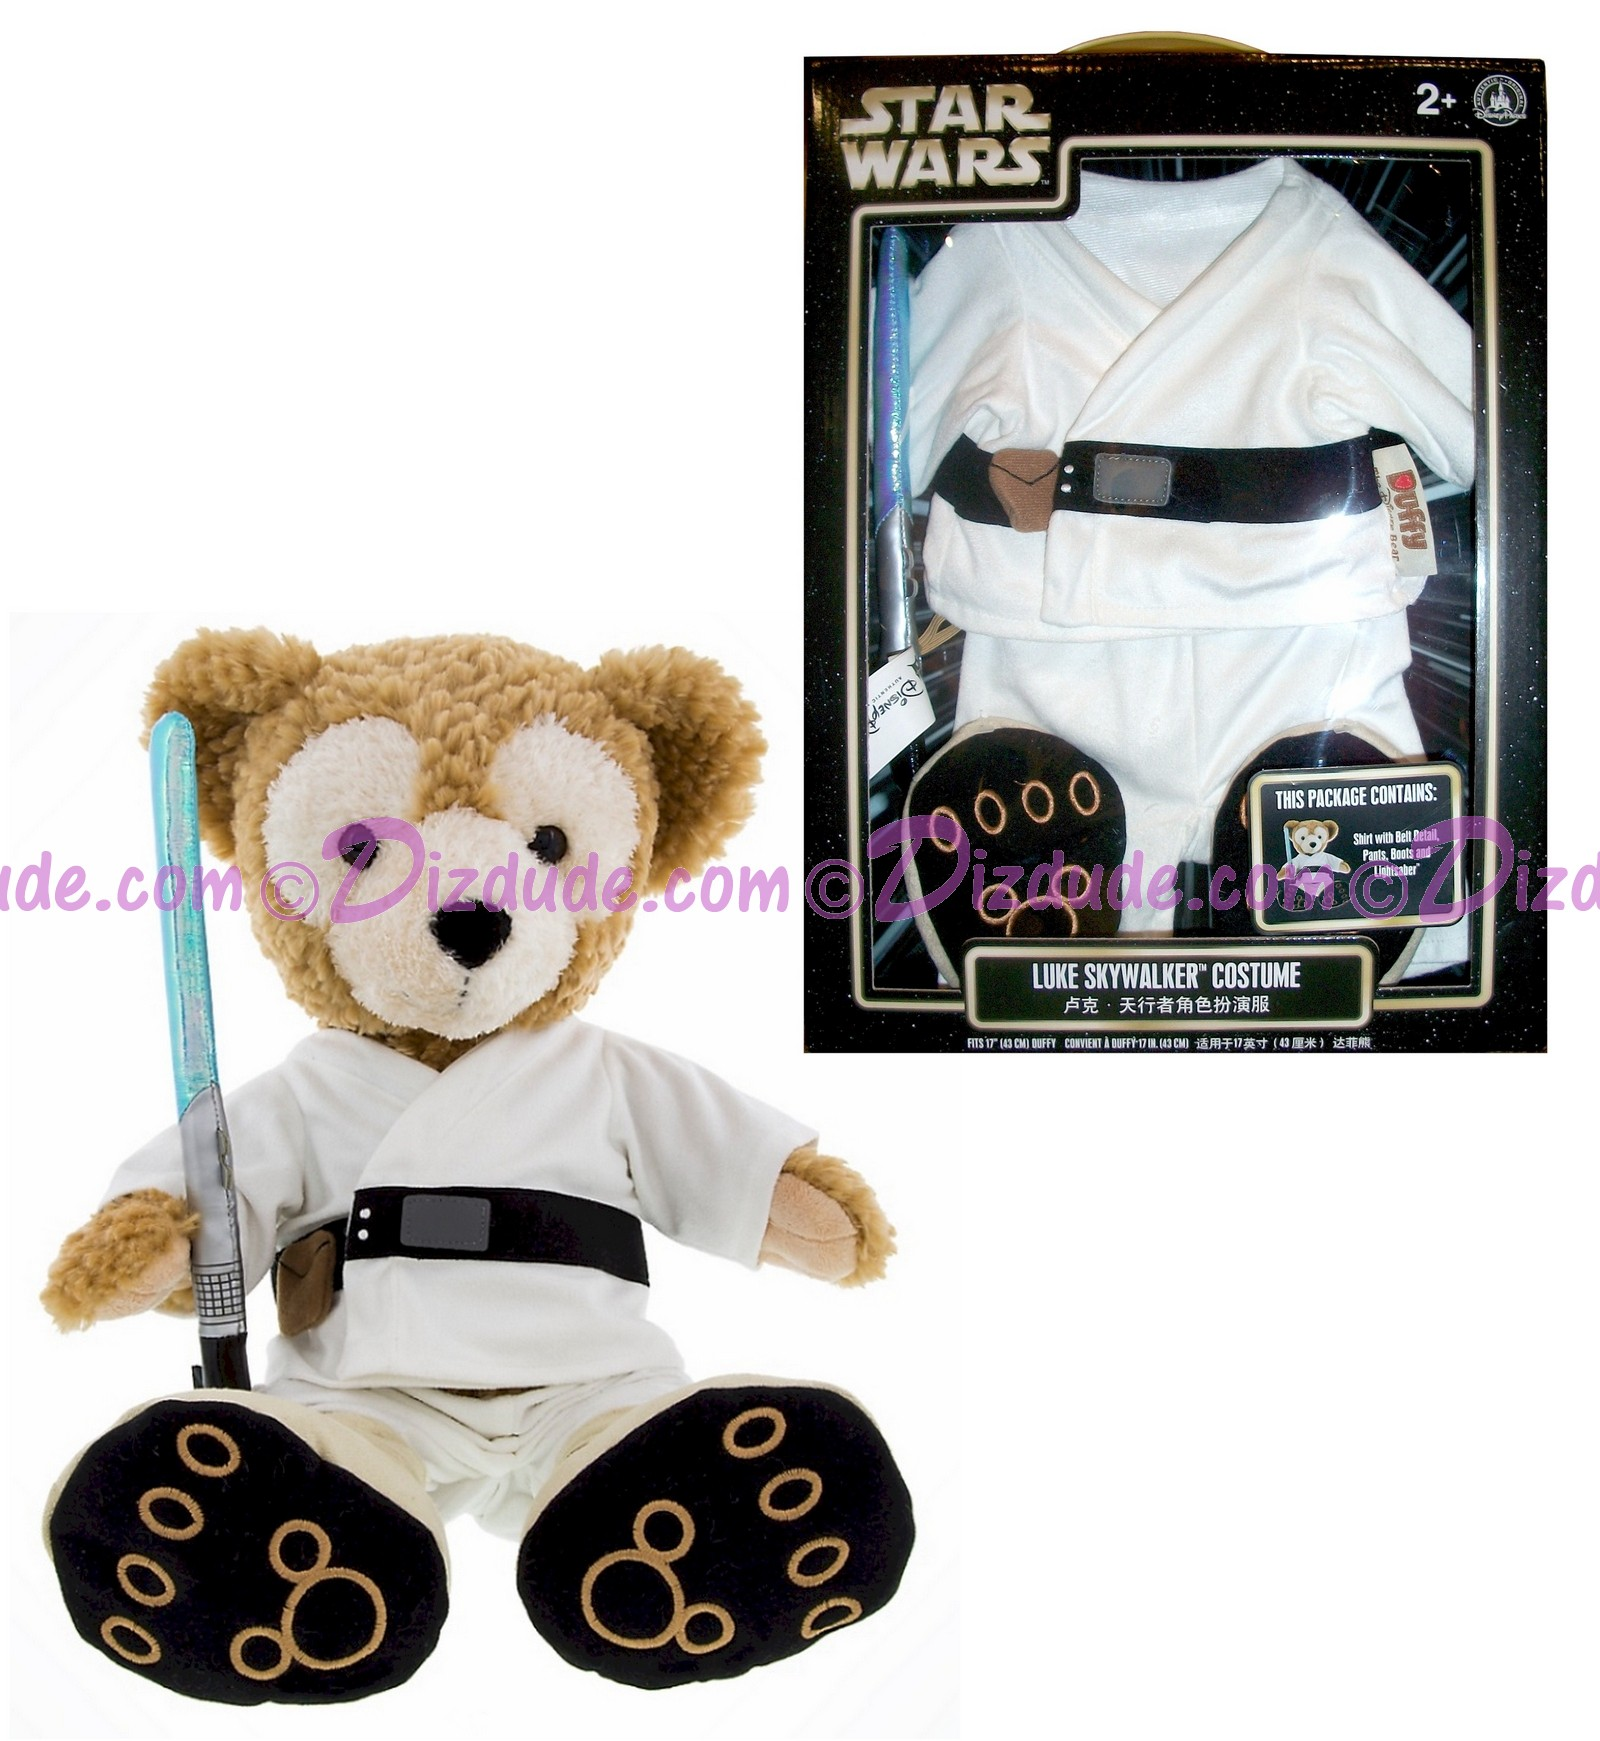 Duffy The Disney Bear - Star Wars Luke Skywalker Costume for 17 inch Plush © Dizdude.com